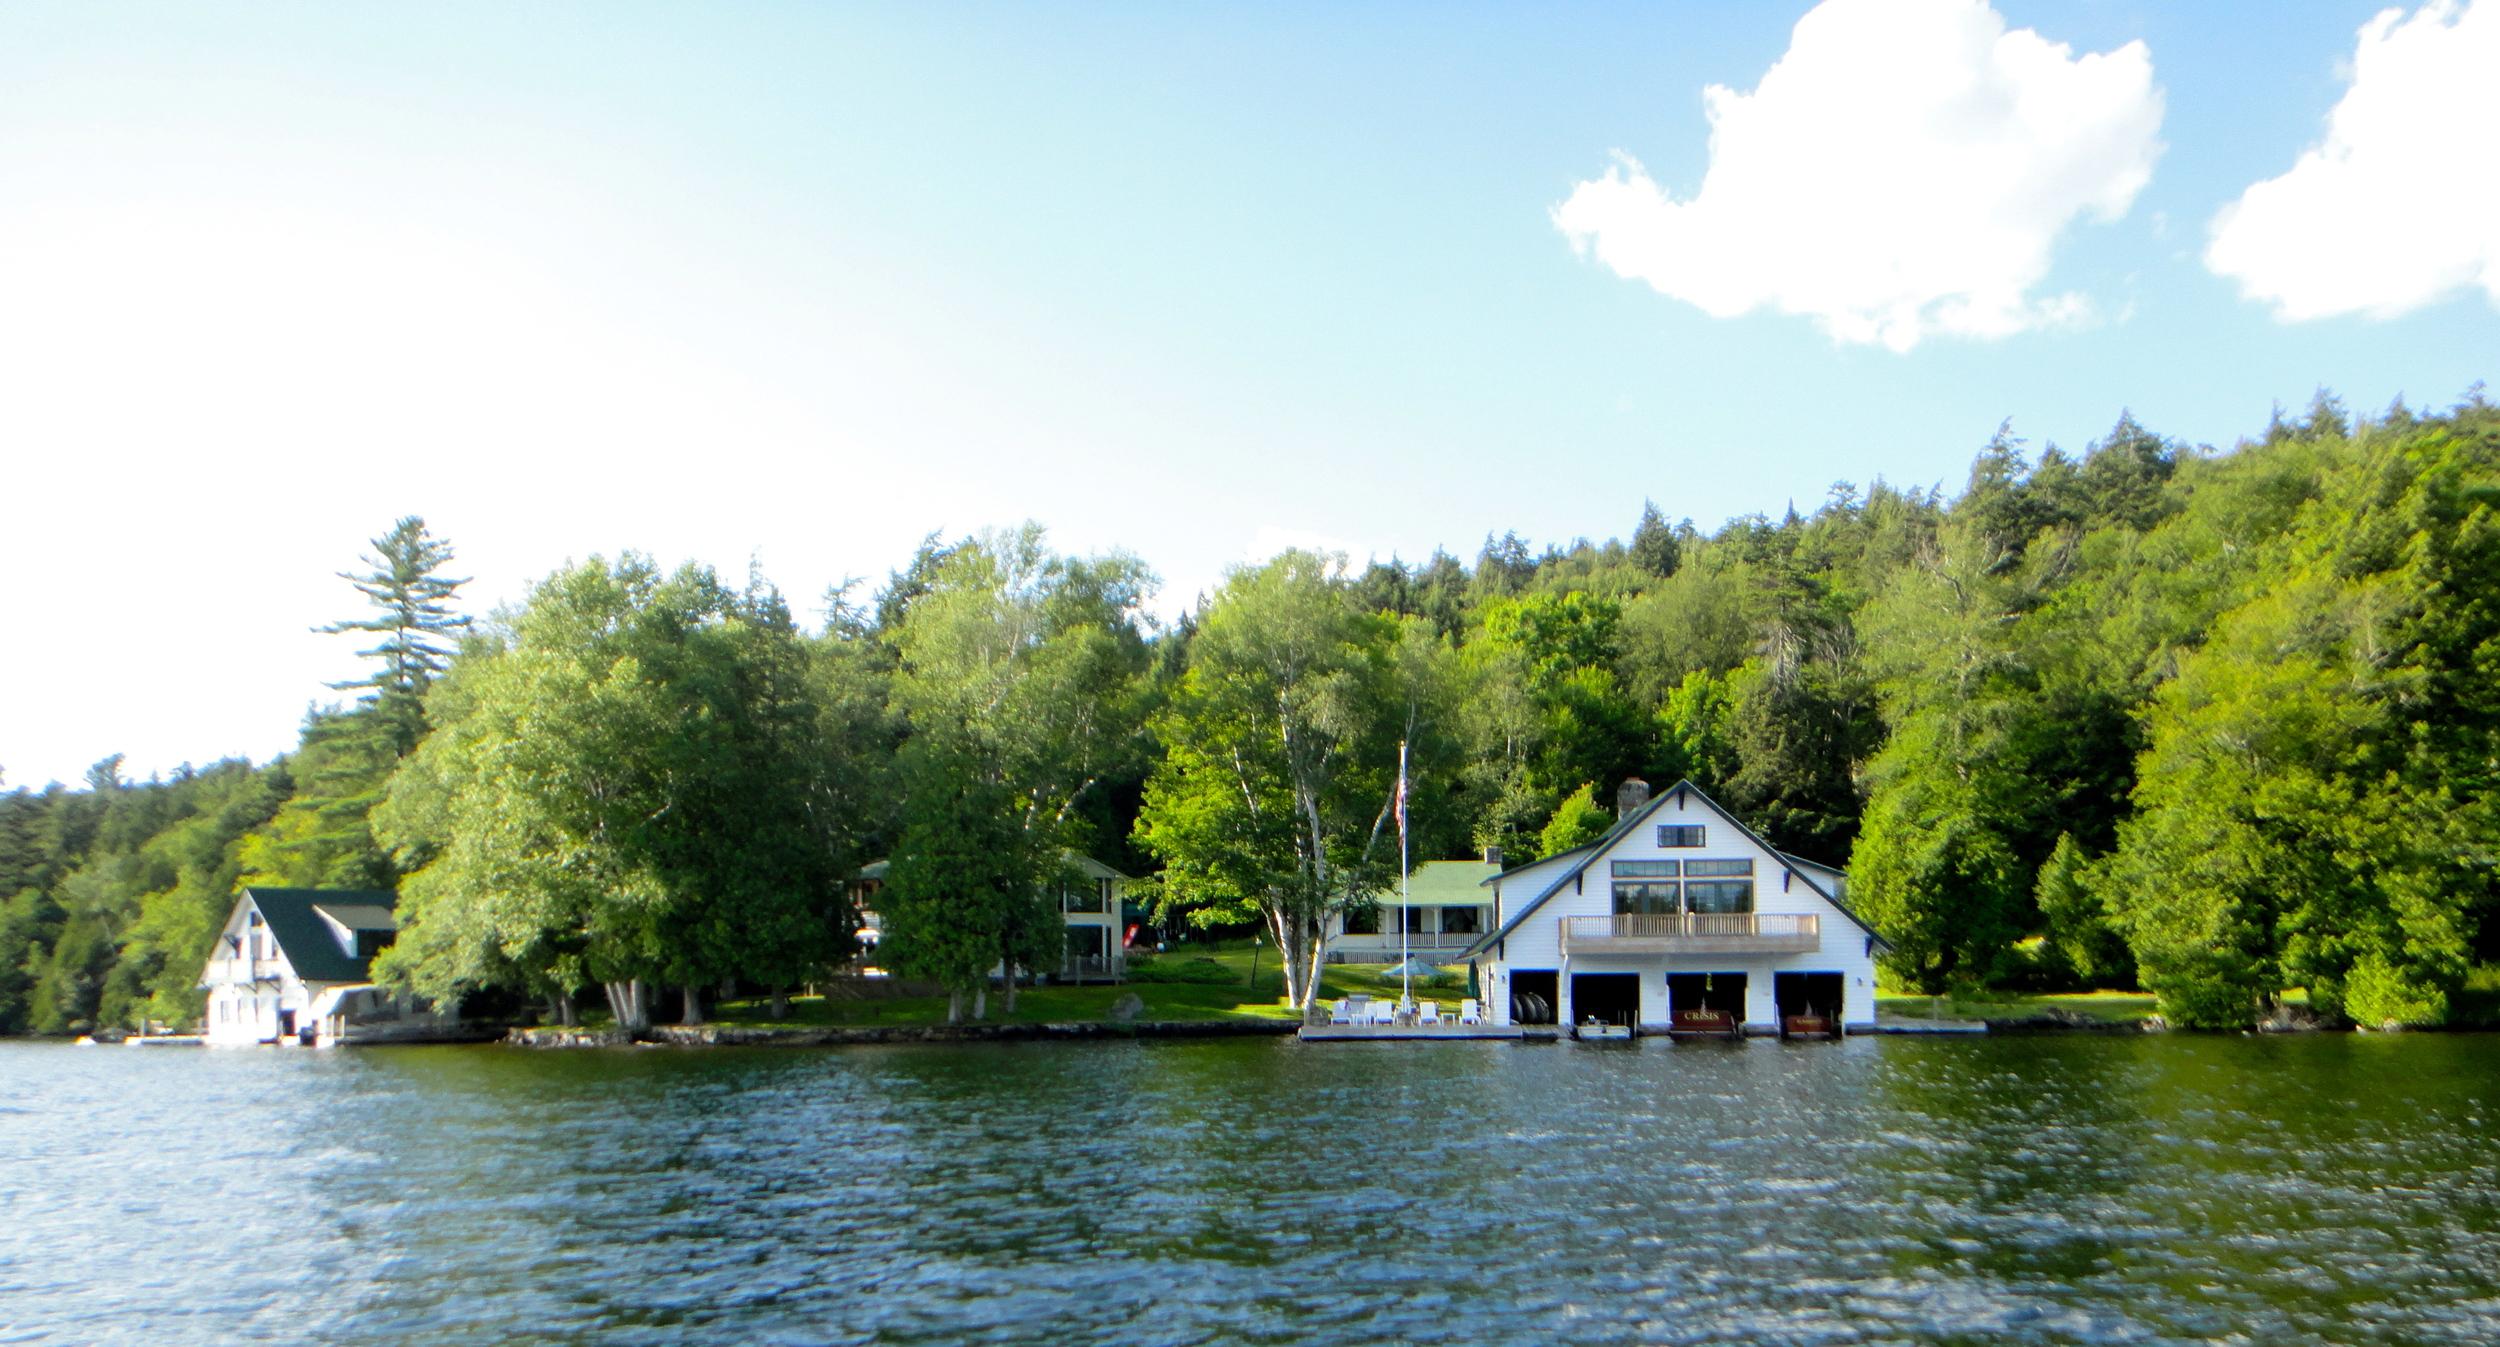 Camp Sunshine on Lake Placid